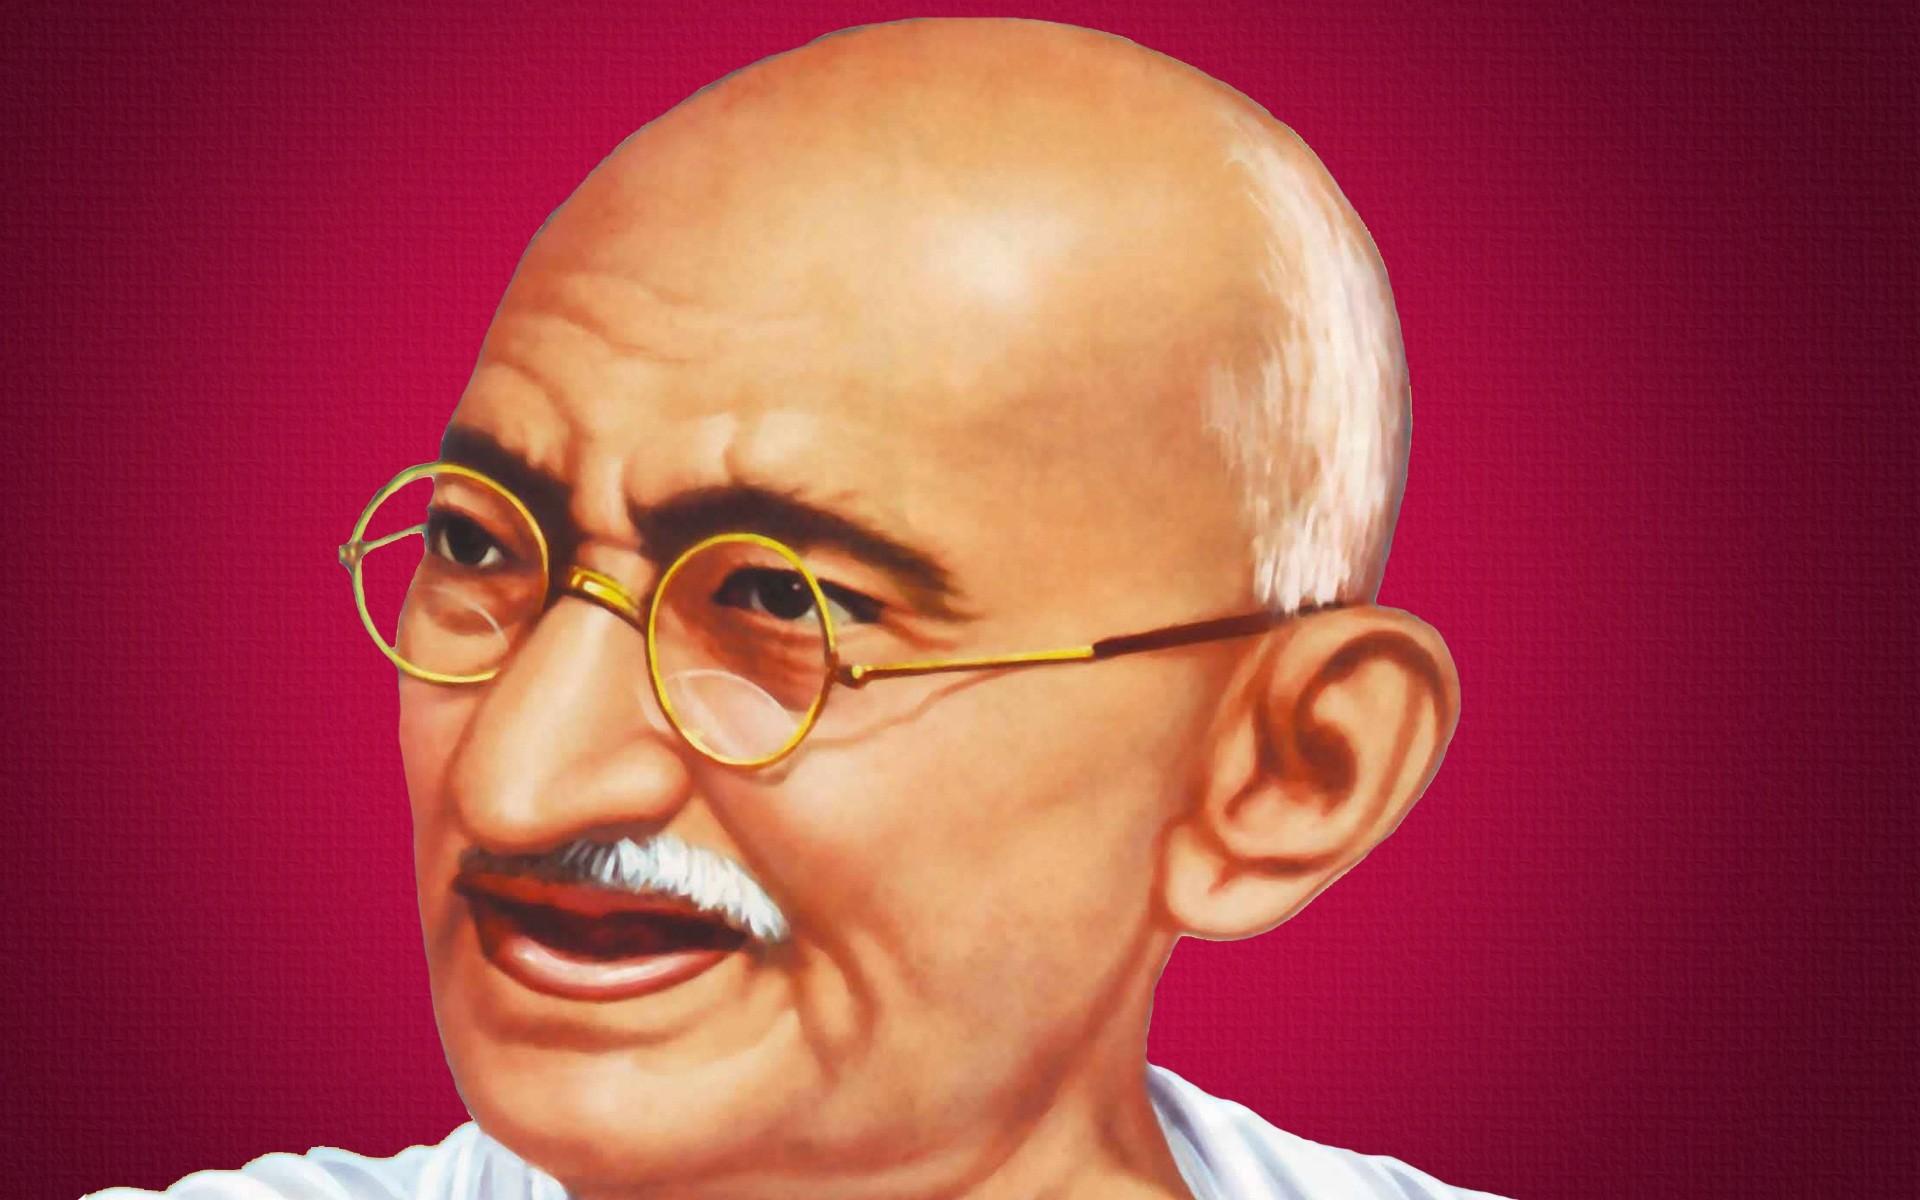 Gandhi Wallpapers With Quotes Mahatma Gandhi Wallpapers 183 ①